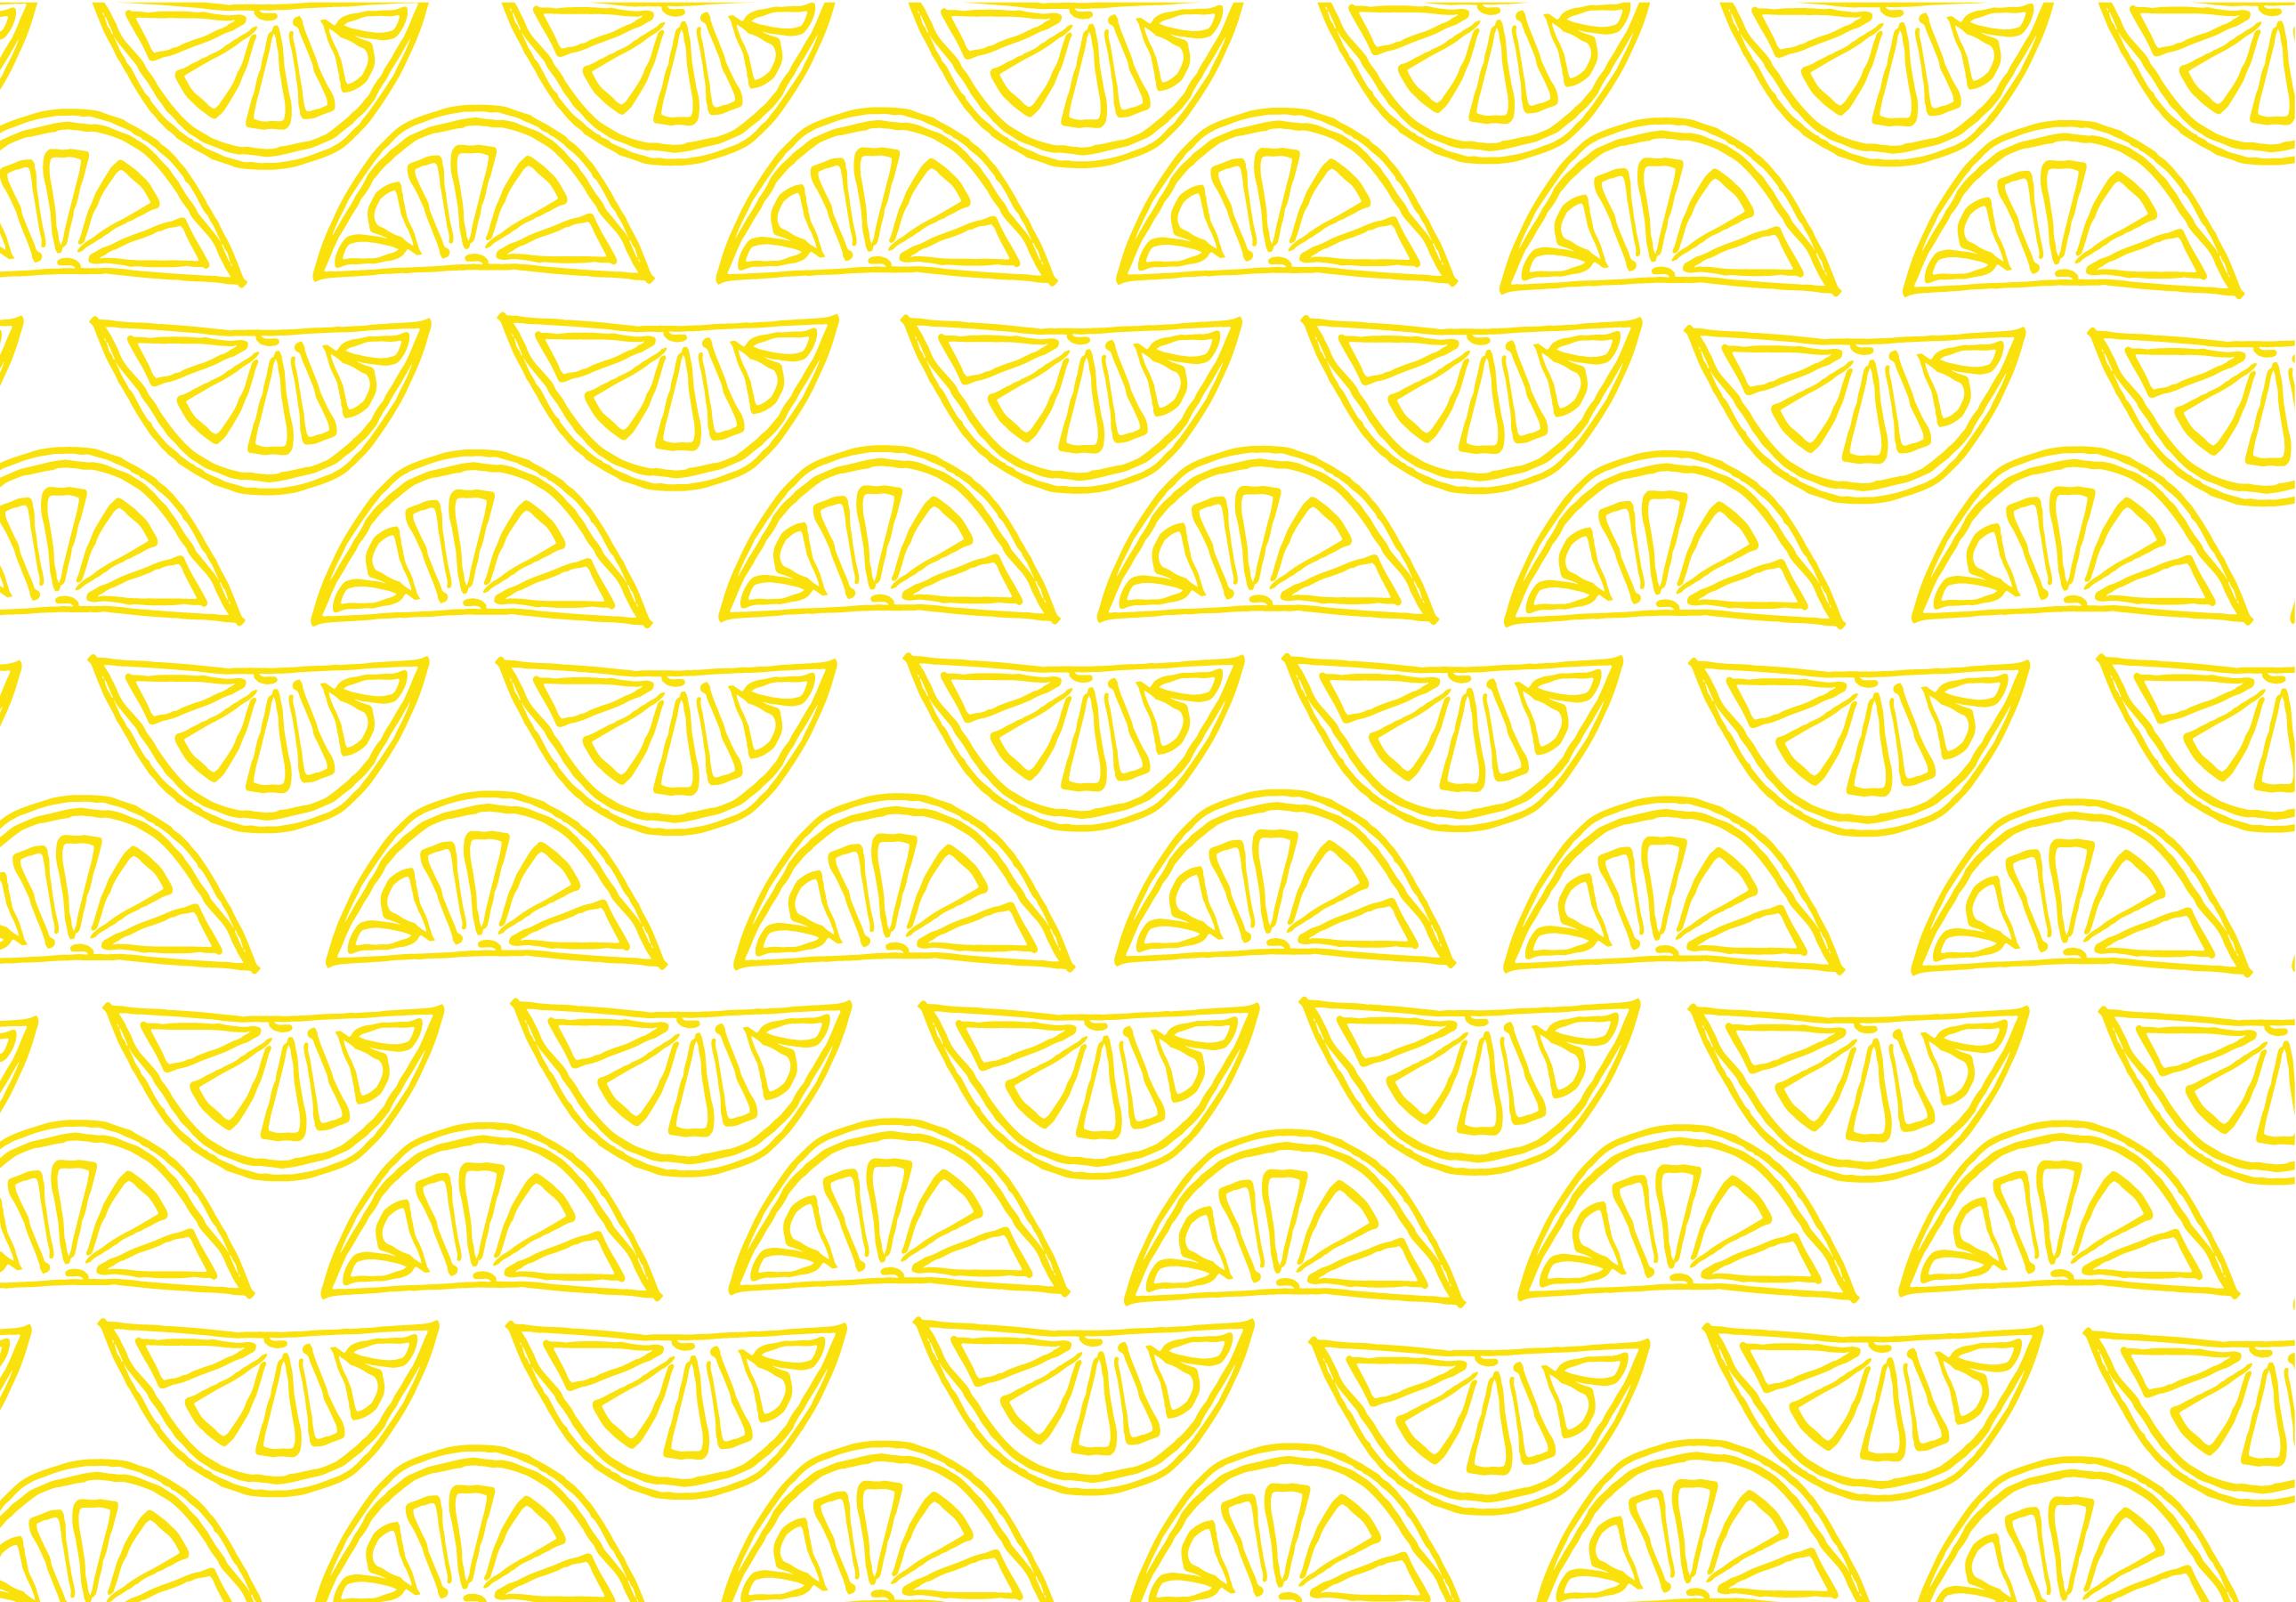 Styldbygrace_LemonSummer_YellowWedges_Wallpaper_Desktop